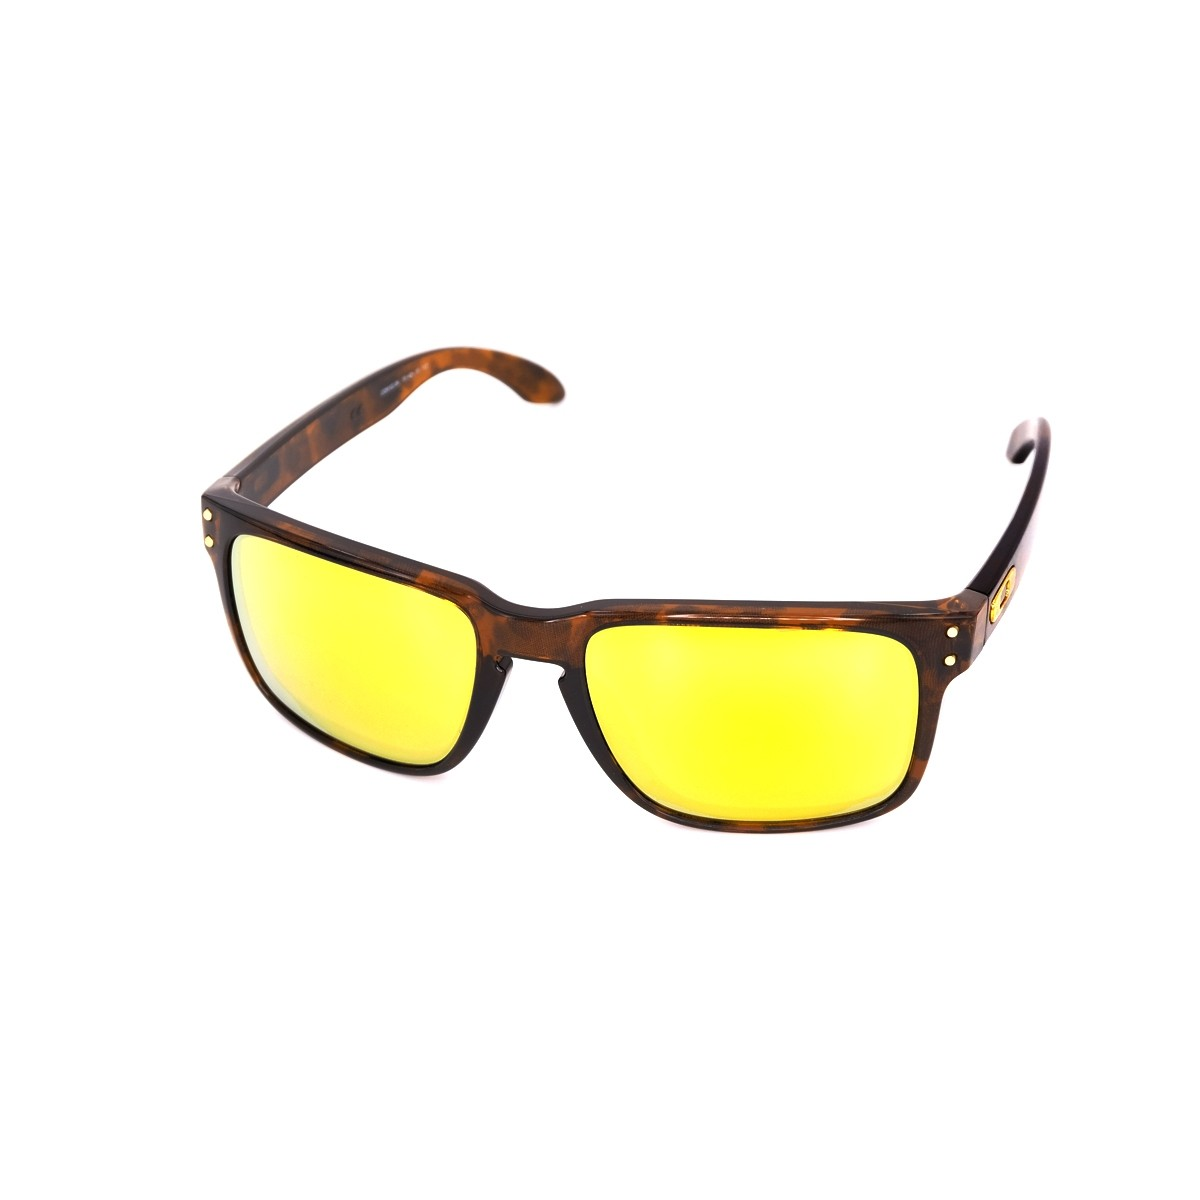 Oakley Holbrook 9102-34 Shaun White Ed., 96,00€, Occhiali Oakley Marrone a forma Rettangolare